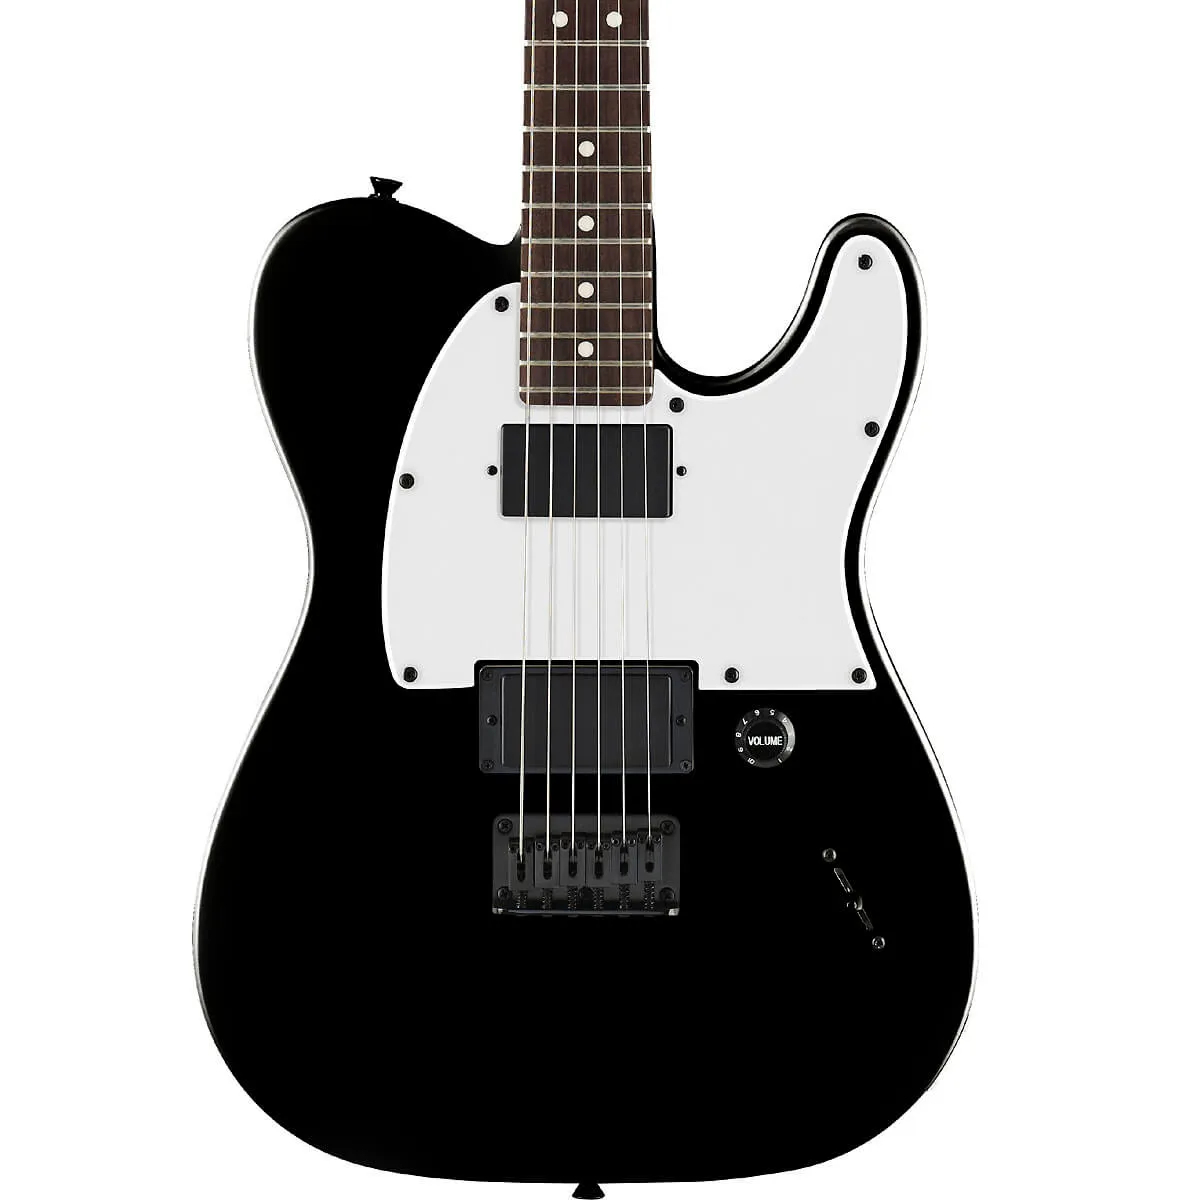 Guitarra Fender Squier Jim Root Telecaster Black